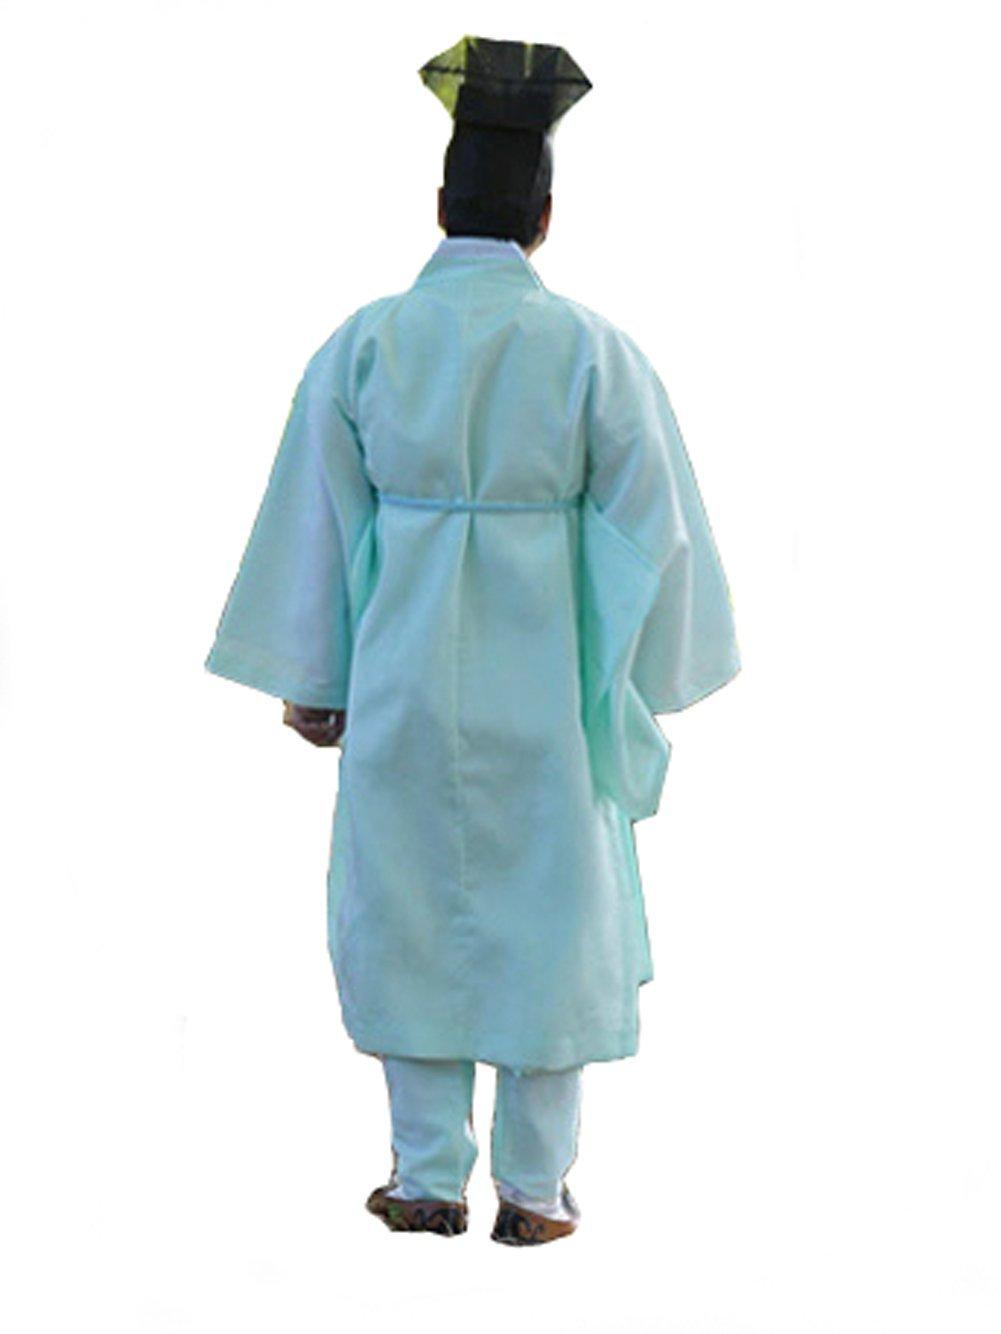 Men Water Silk Robe, Korea Traditional Men Clothing Dopo, Halloween Costumes (jade green, S) by Altair (Image #4)